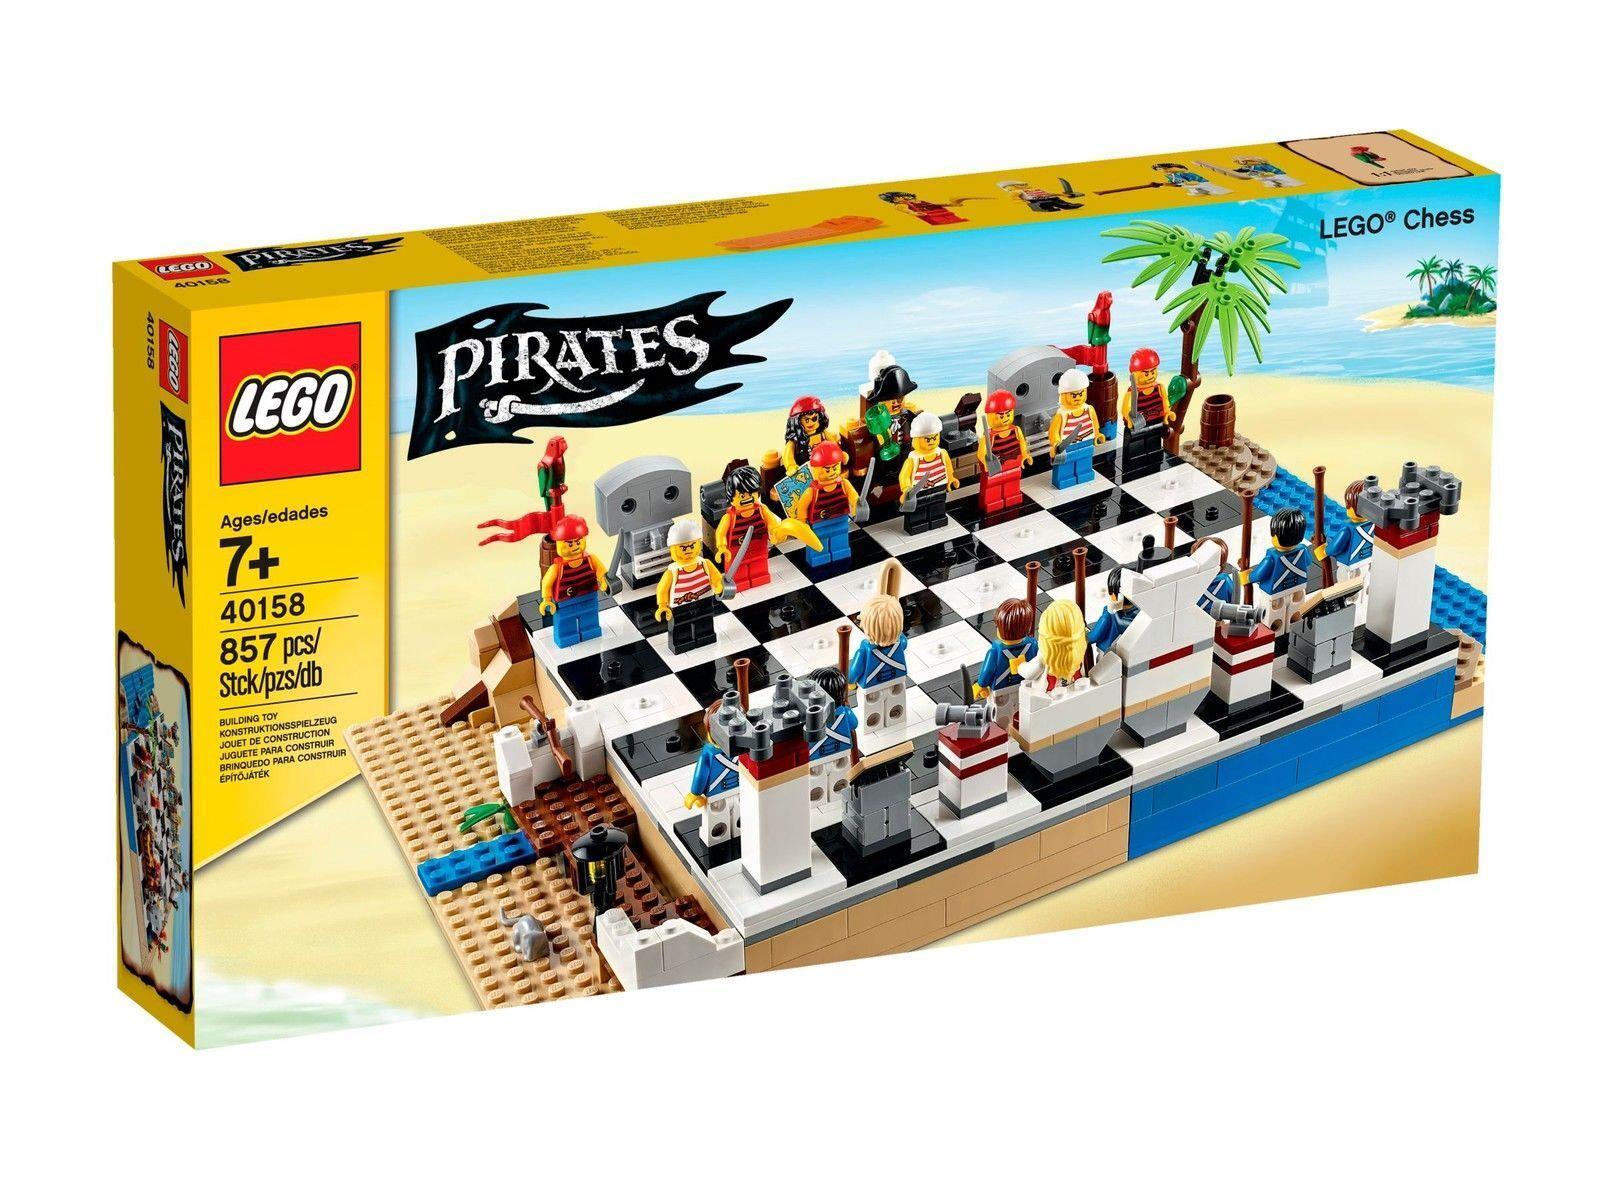 Lego 40158 40158 40158 Pirates Chess Set Pirates vs blueecoats 20 minifigures NEW sealed 9ac540